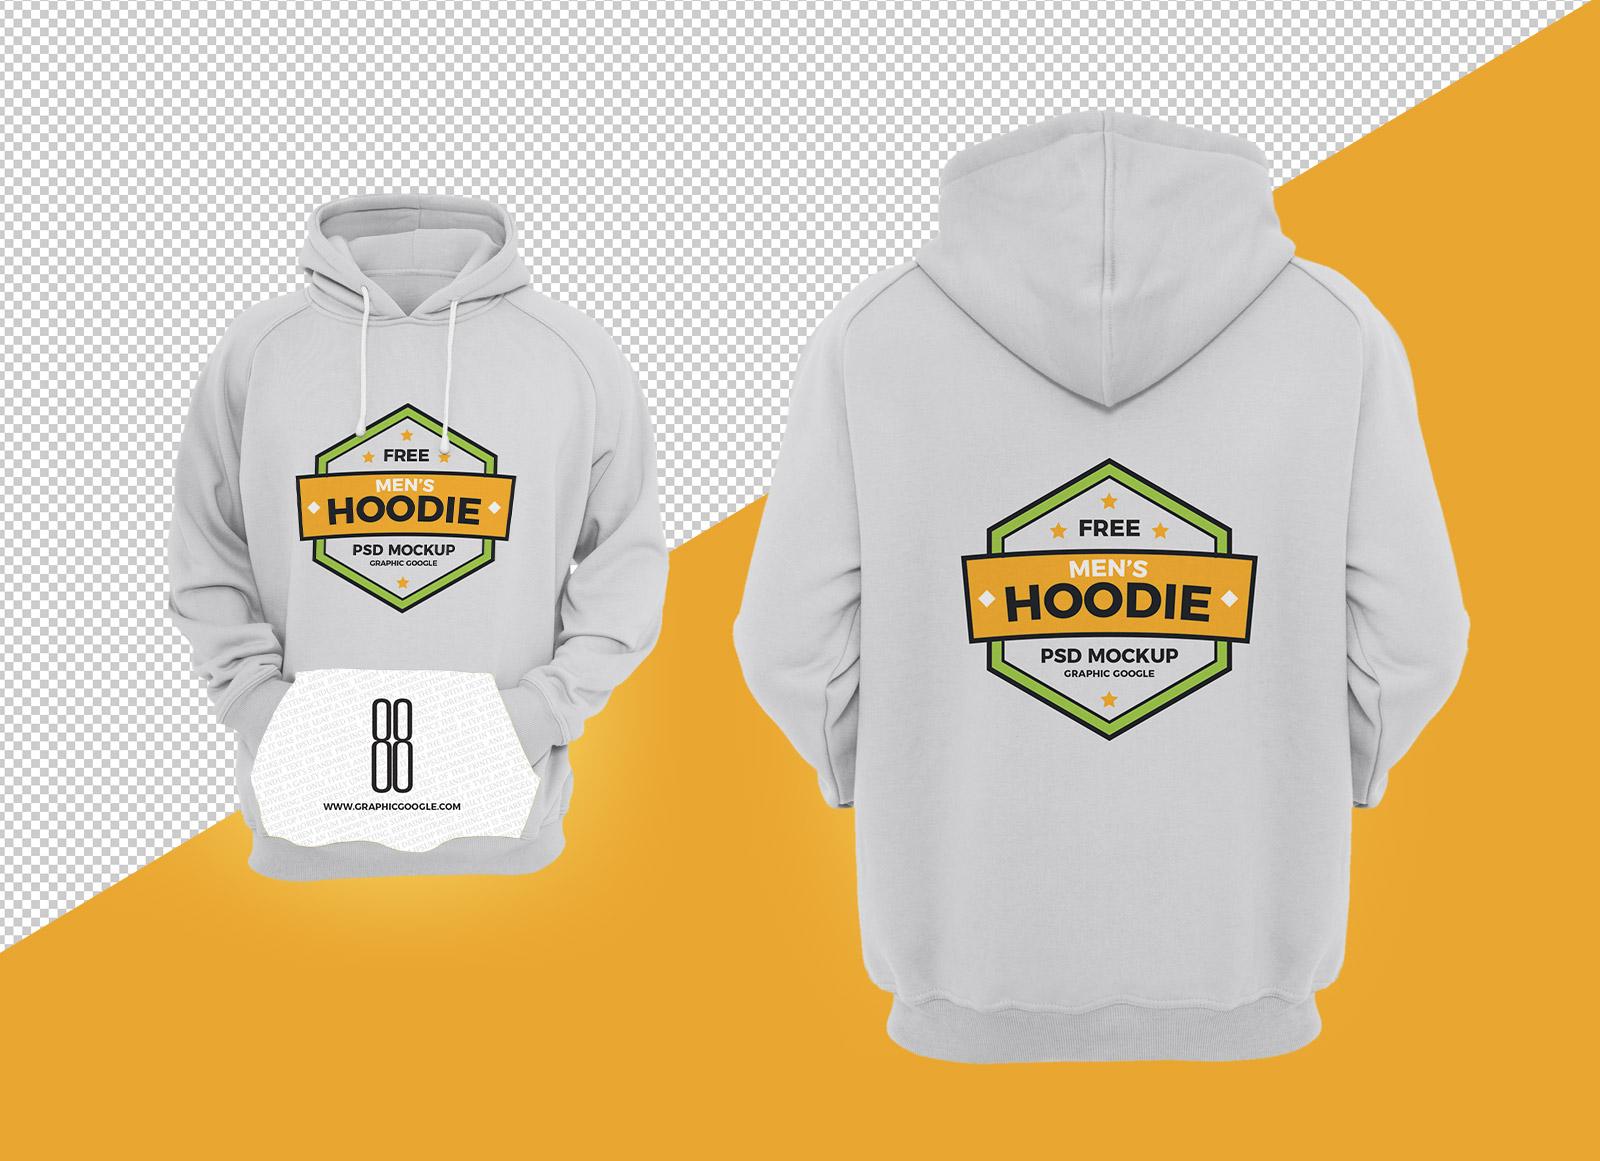 Free Men's Hoodie T shirt Mockup PSD File Good Mockups